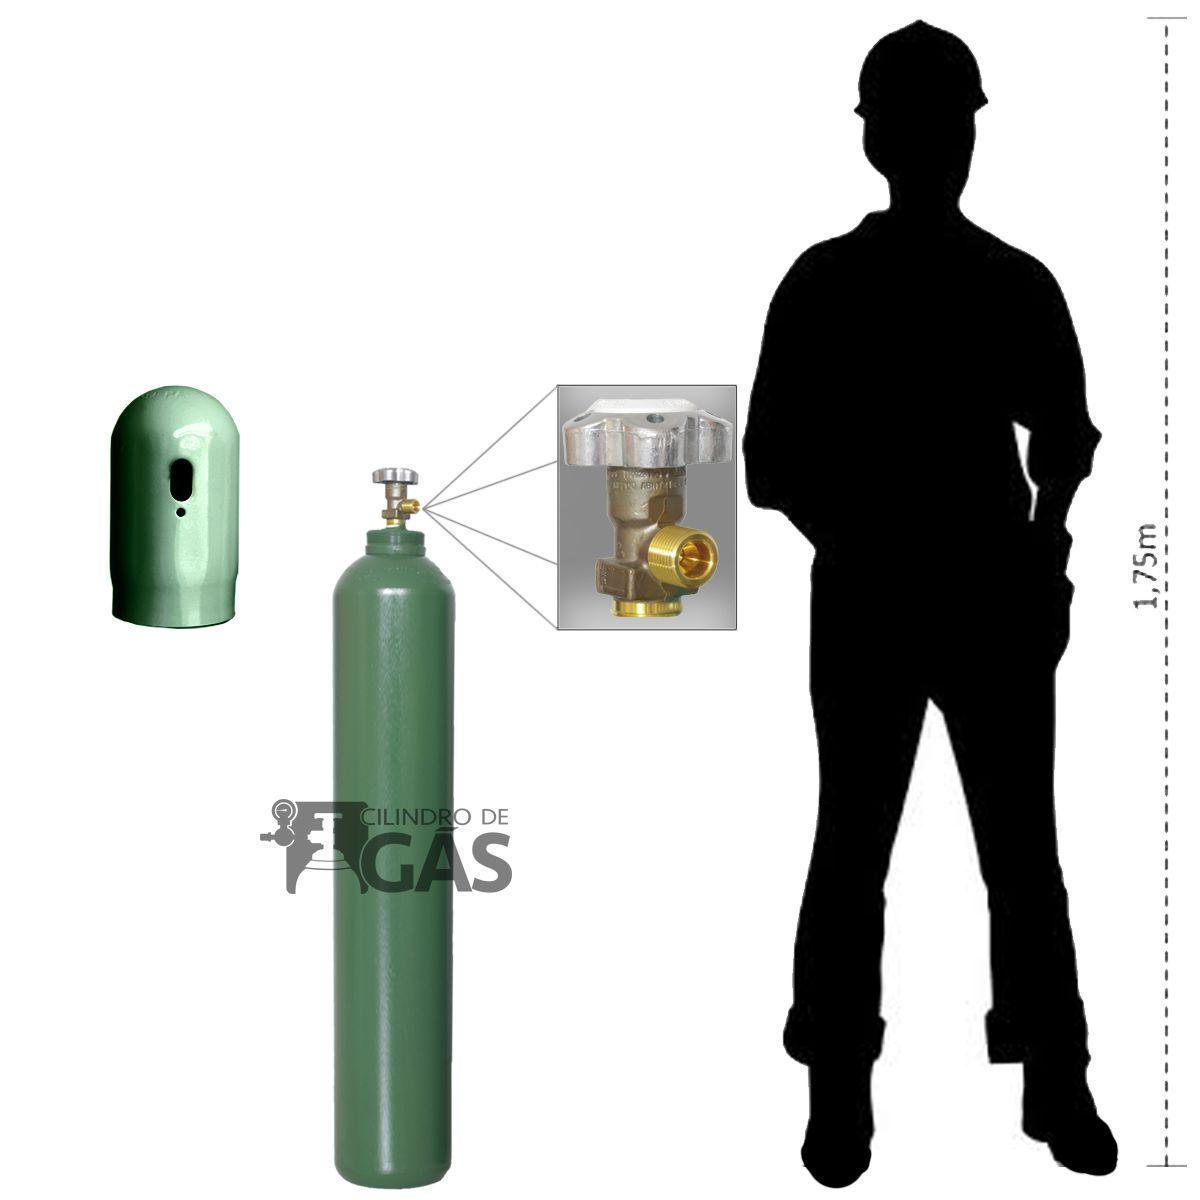 Cilindro para Oxigênio Medicinal - 15L